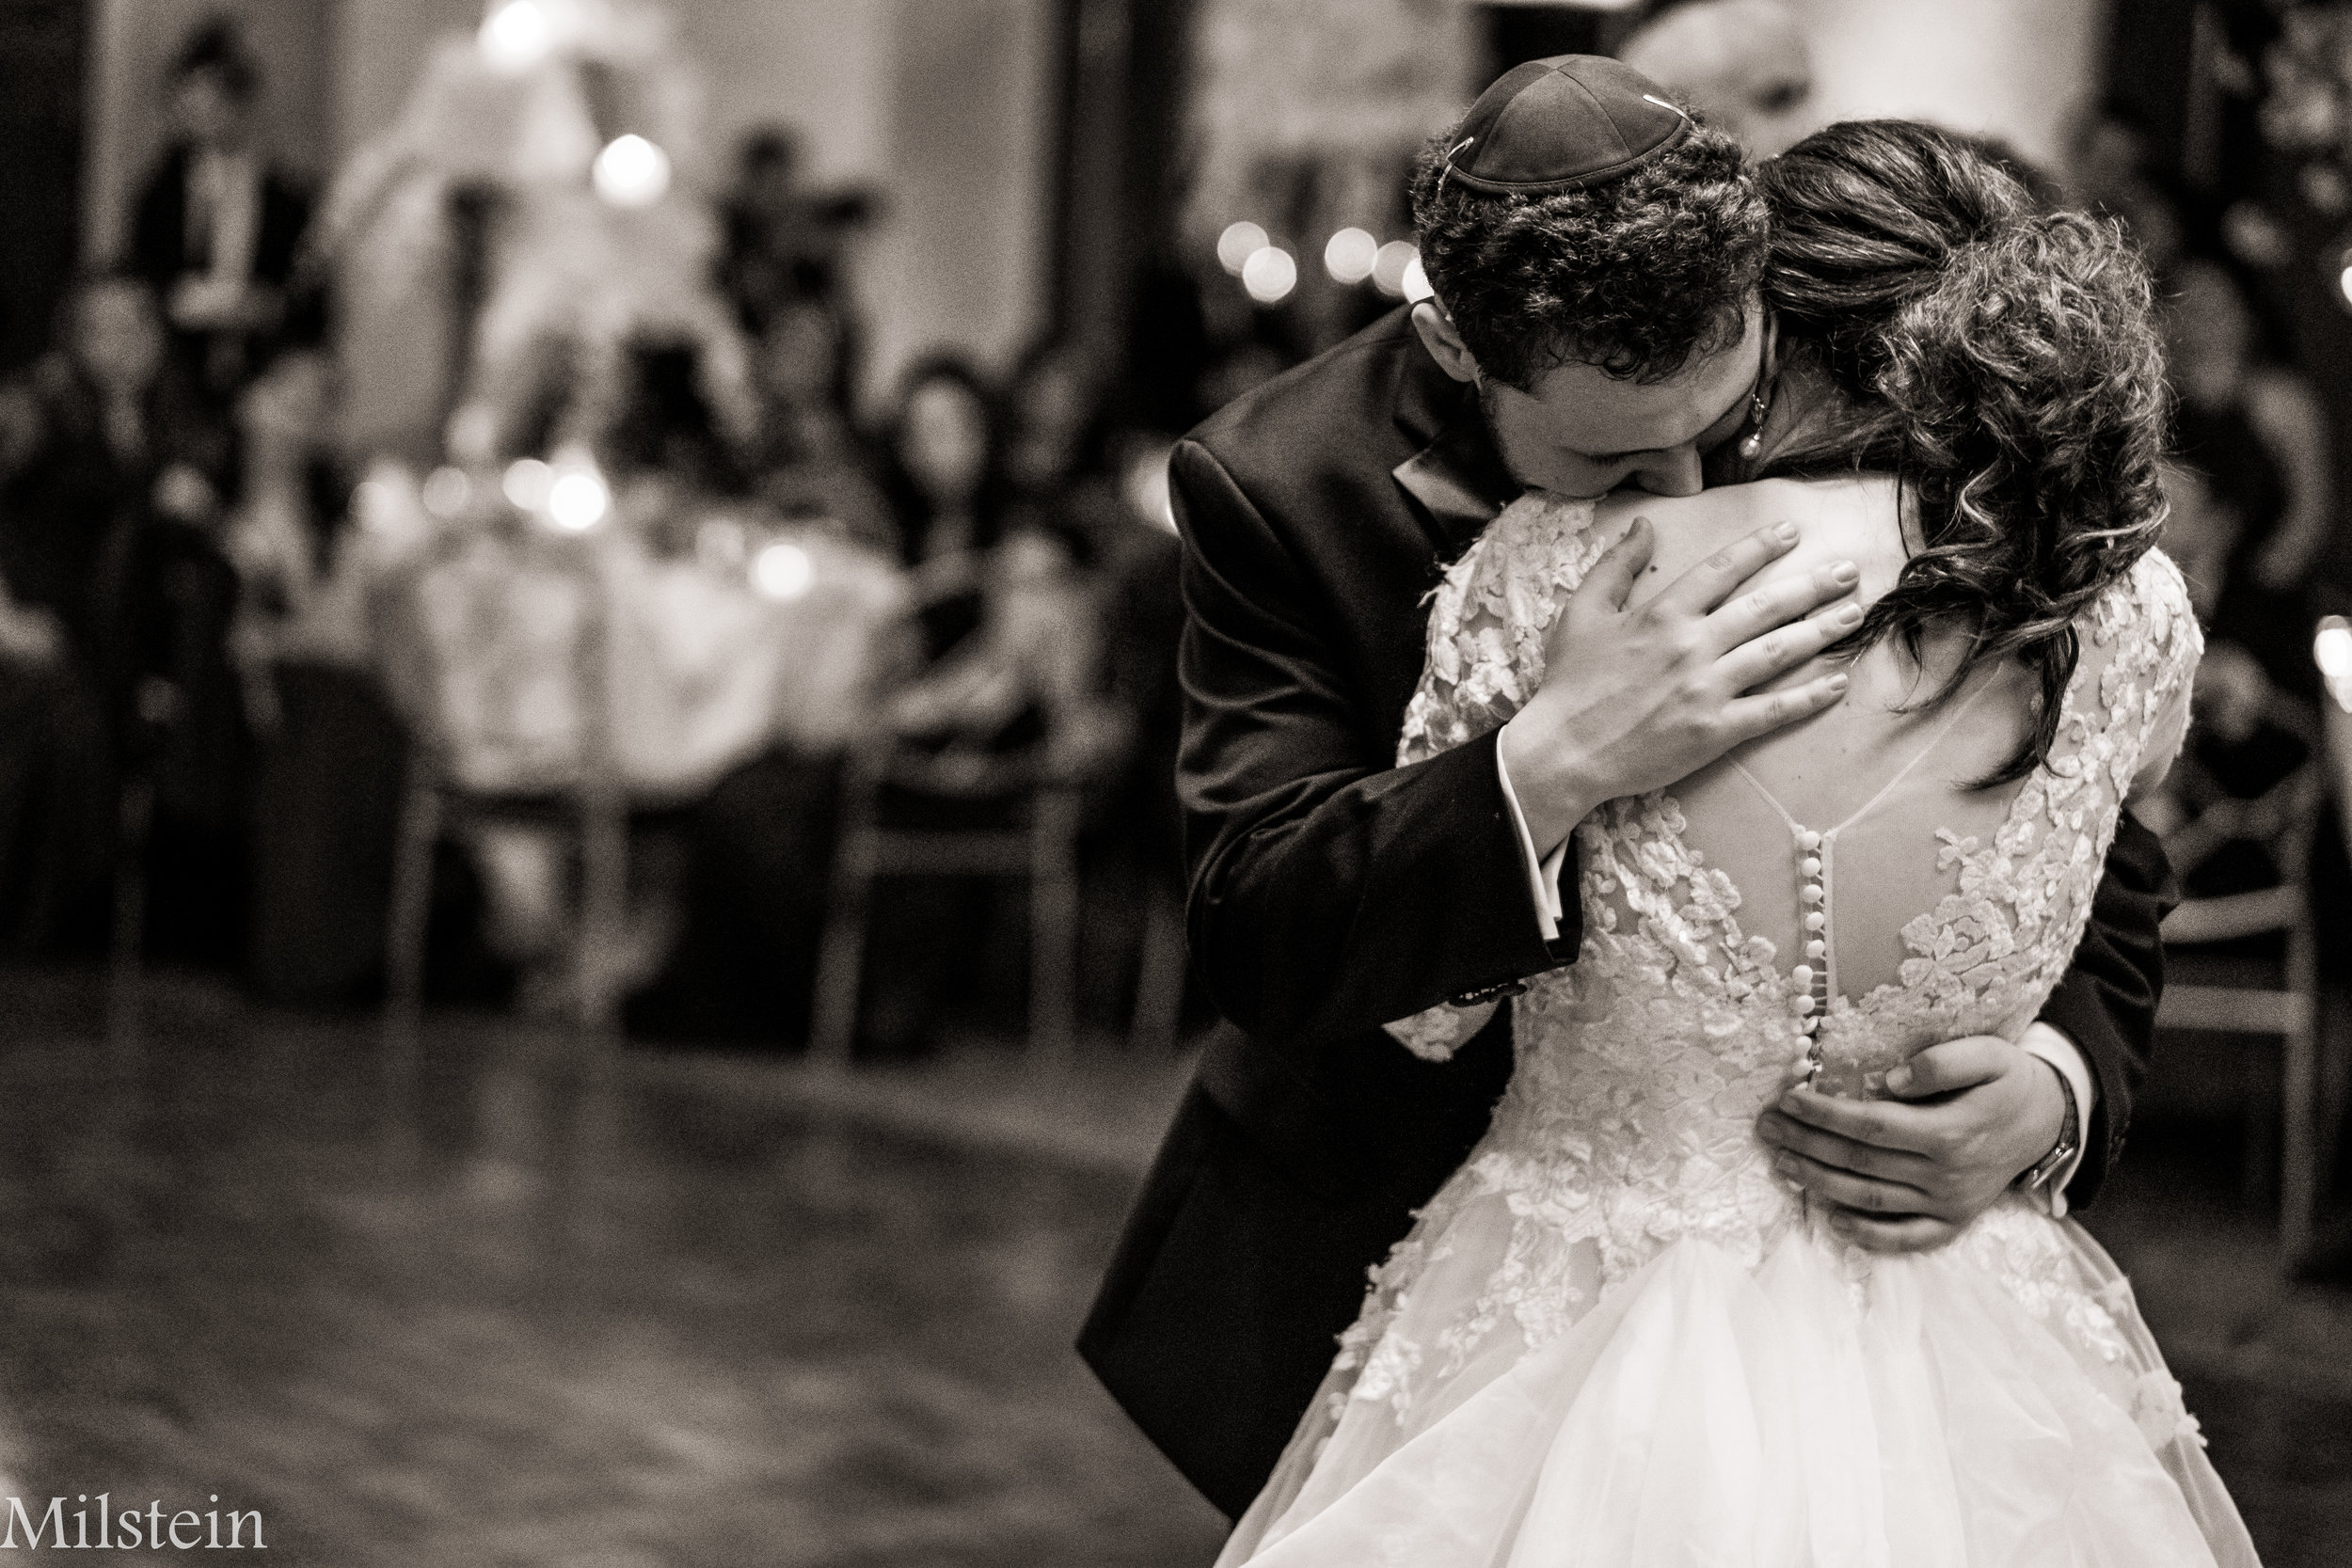 Amy Milstein - New York wedding photography